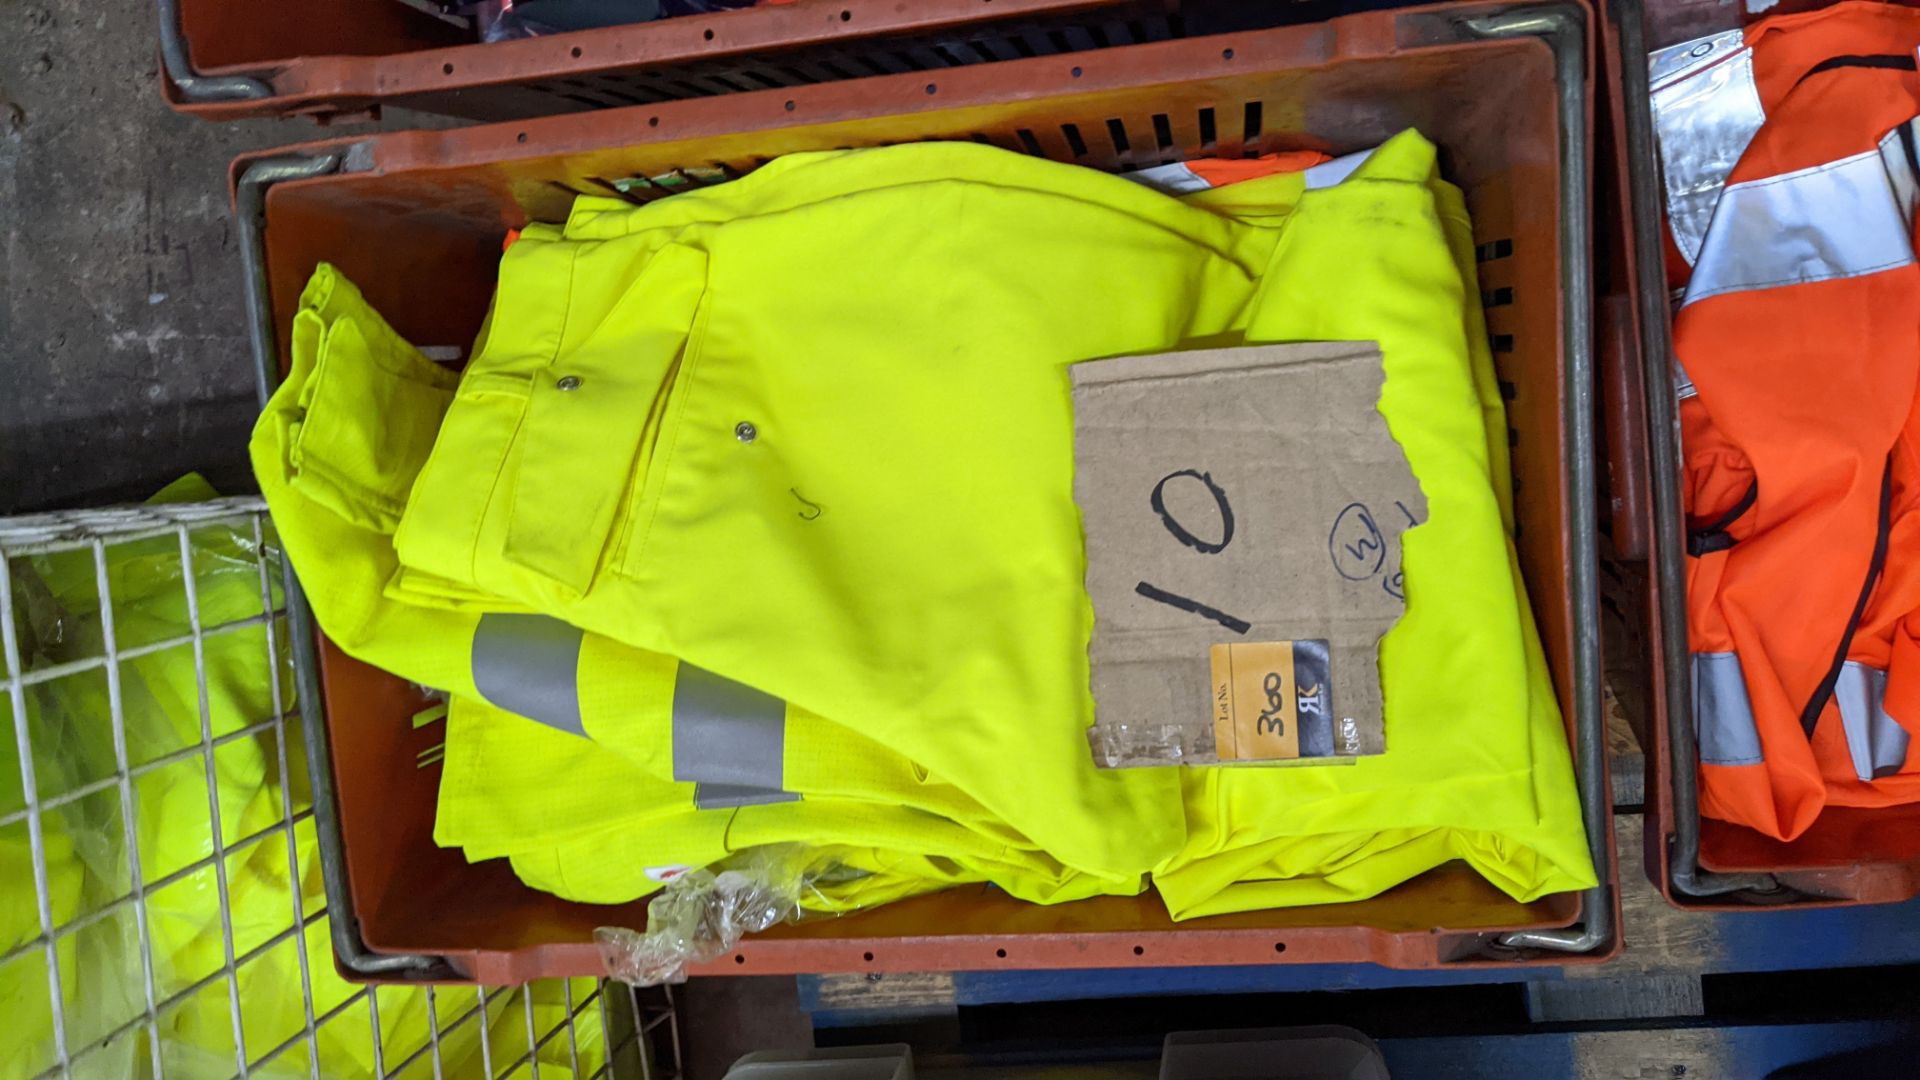 10 off hi-vis trousers in yellow & orange - Image 4 of 4